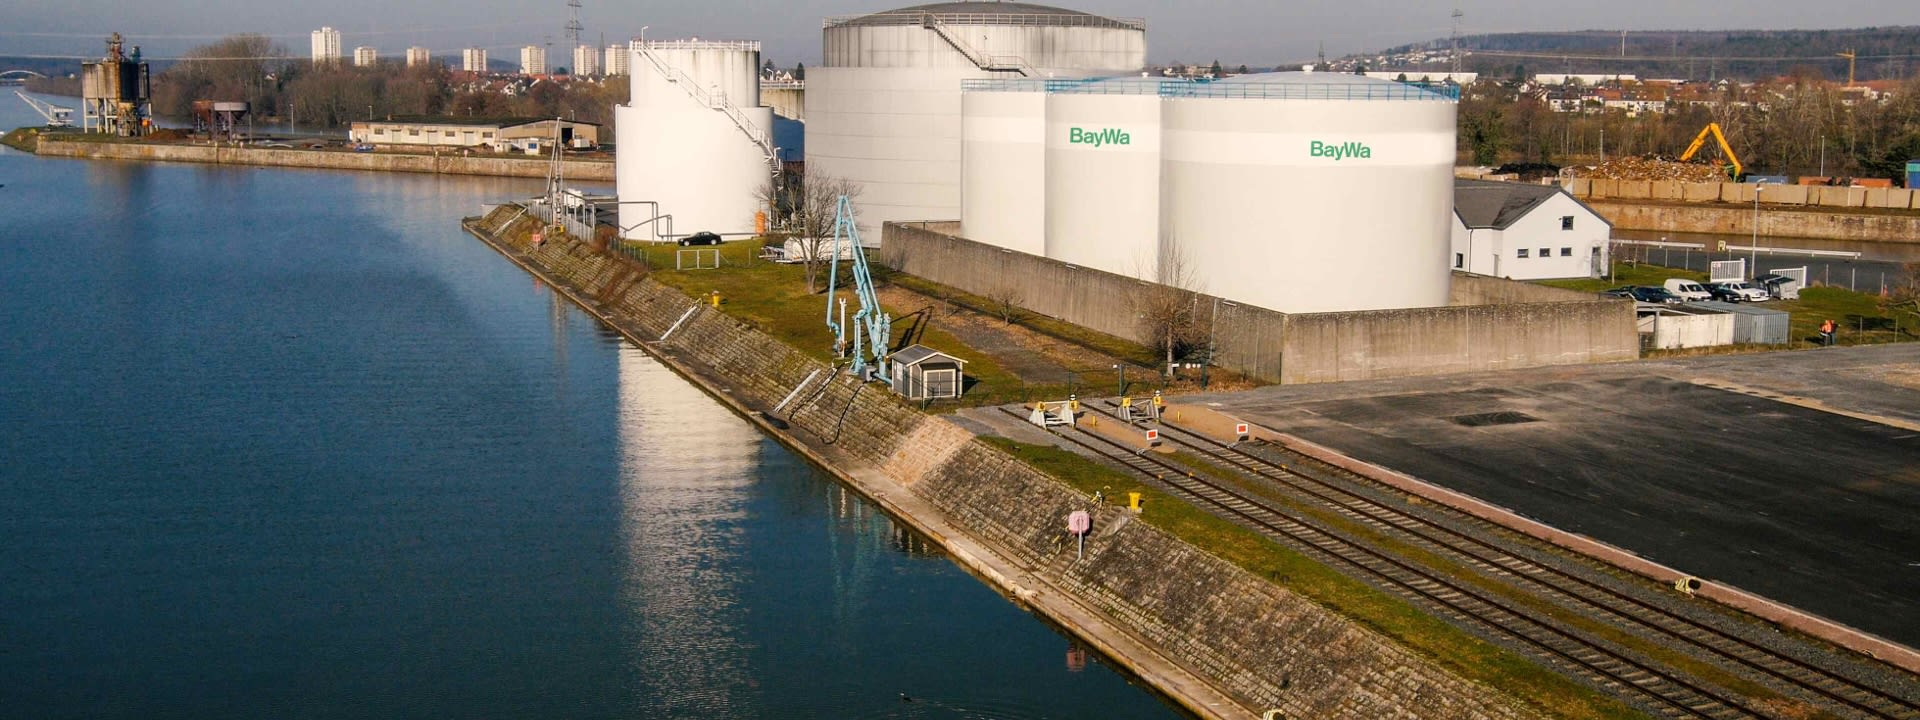 BayWa AG Energie Vertrieb Prien